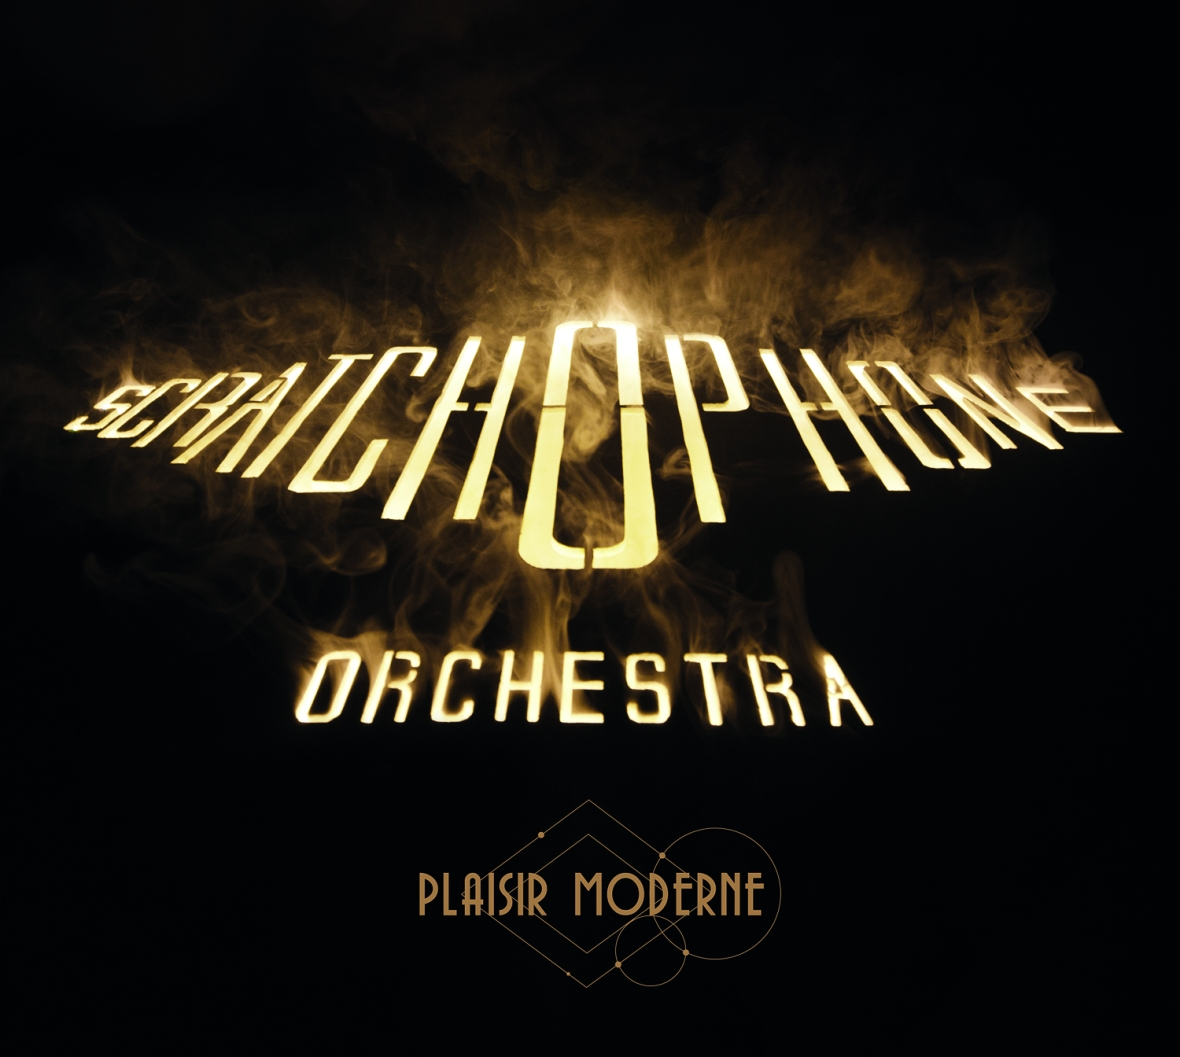 The Scratchophone Orchestra, Plaisir Moderne